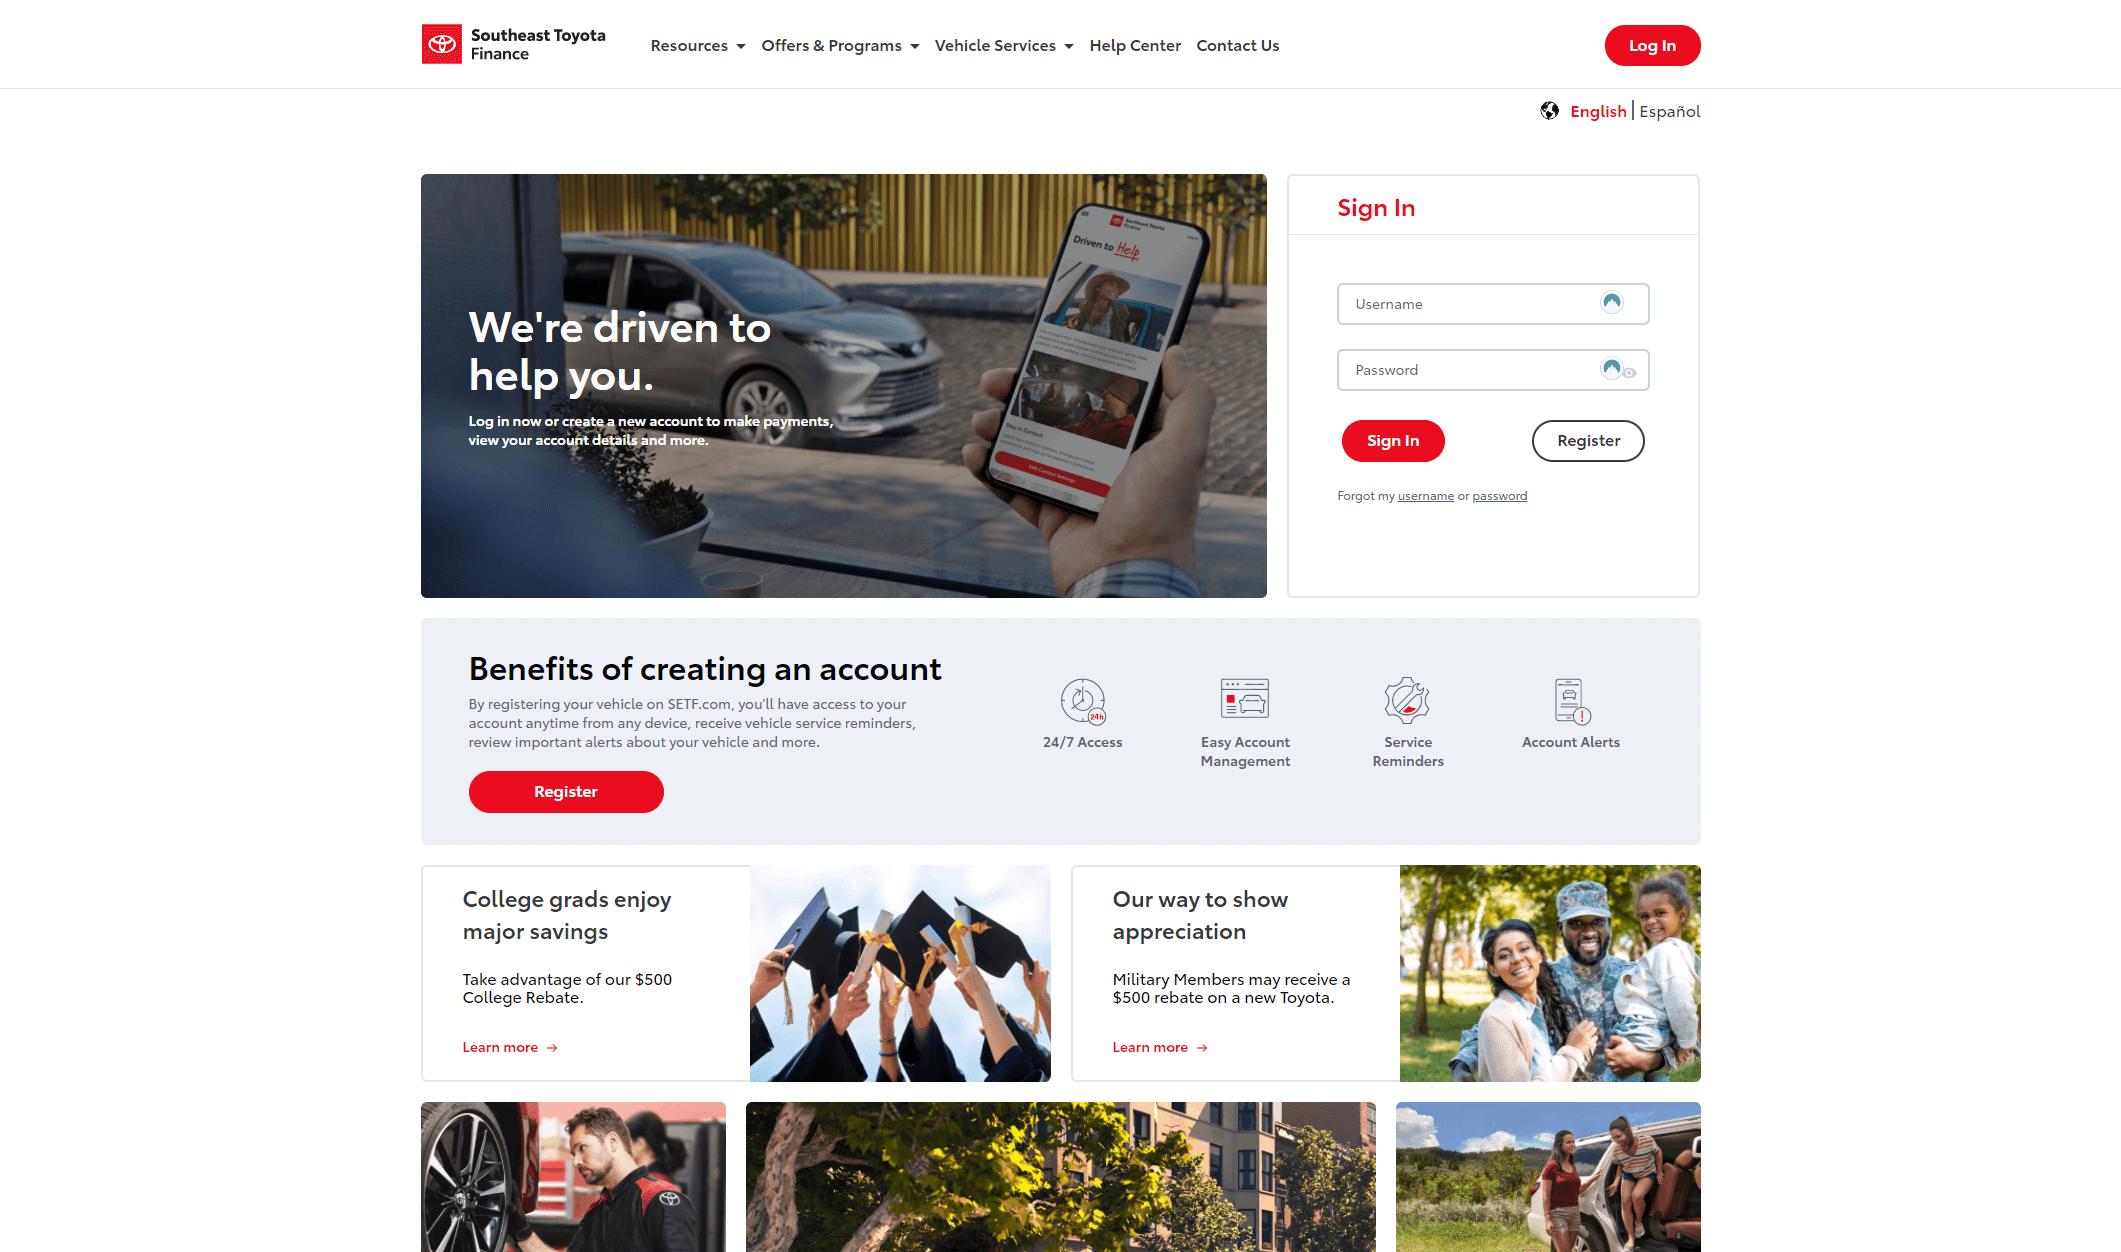 www.setf.com